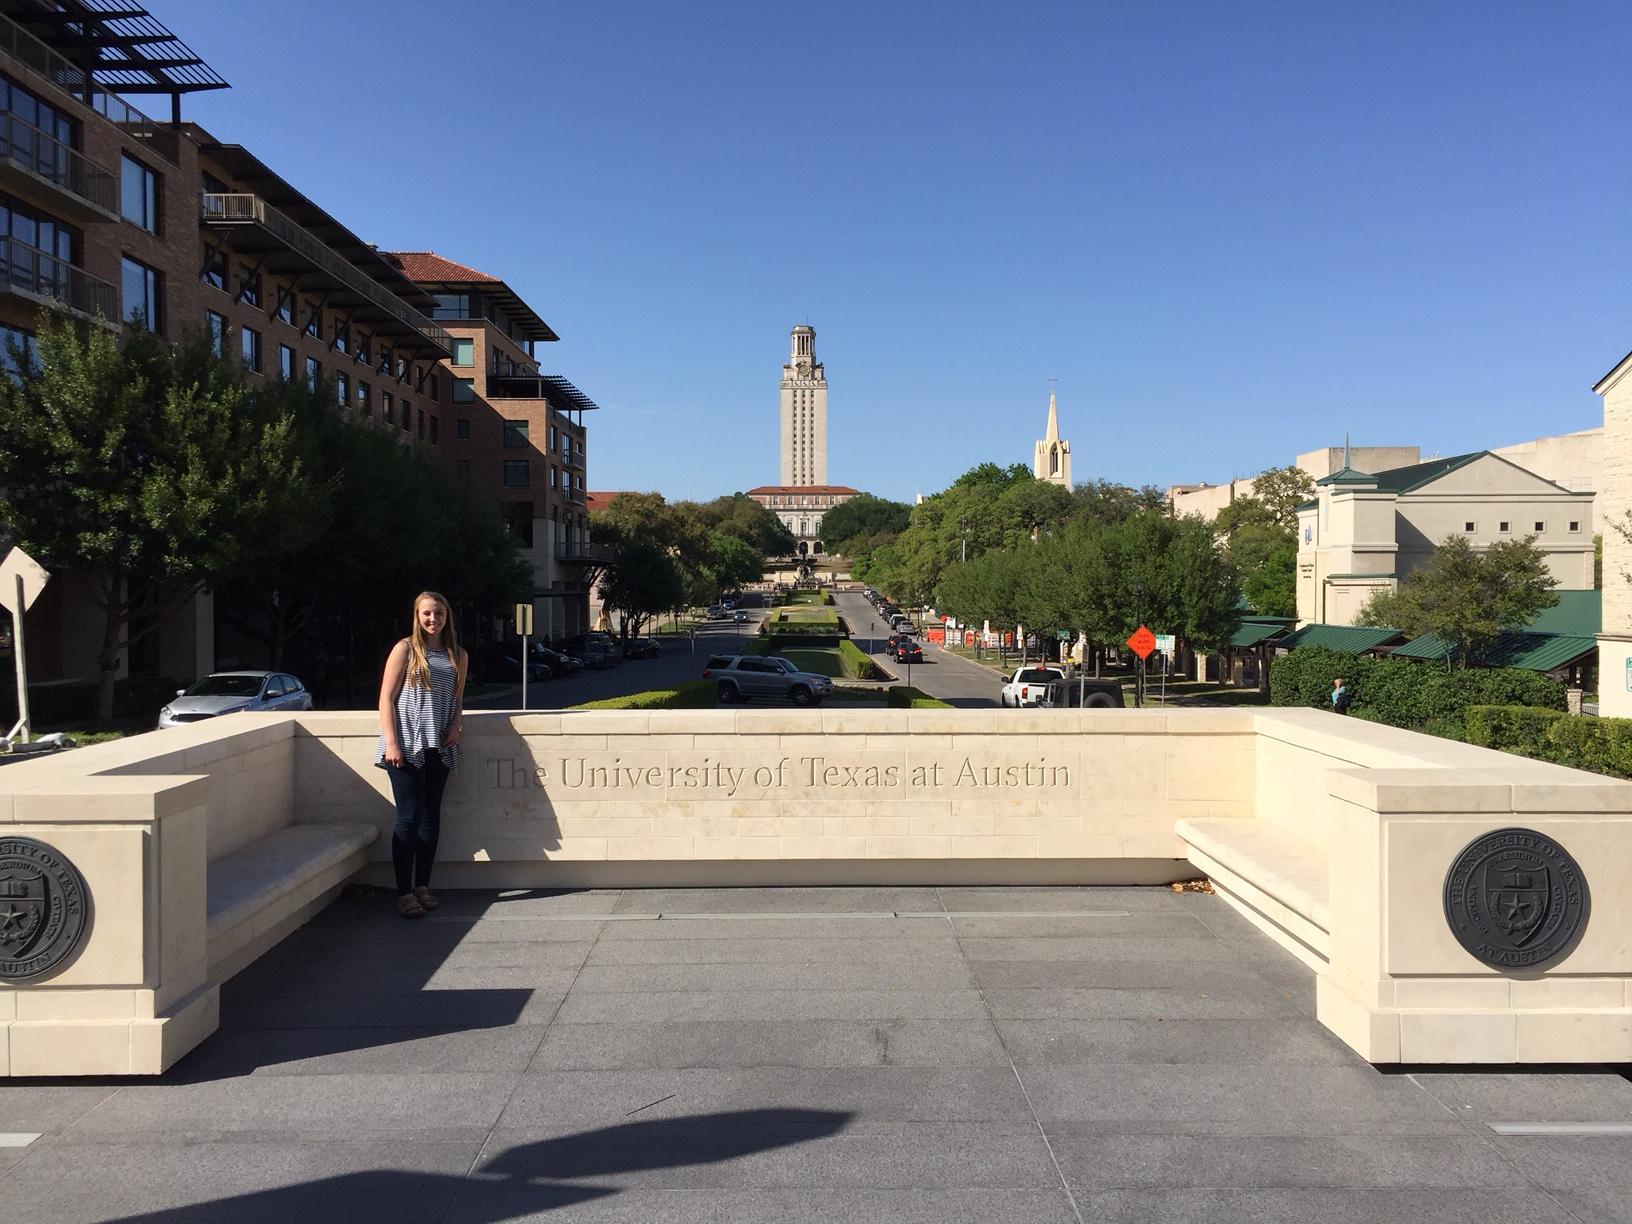 Univ_of_Texas_at_Austin.jpg